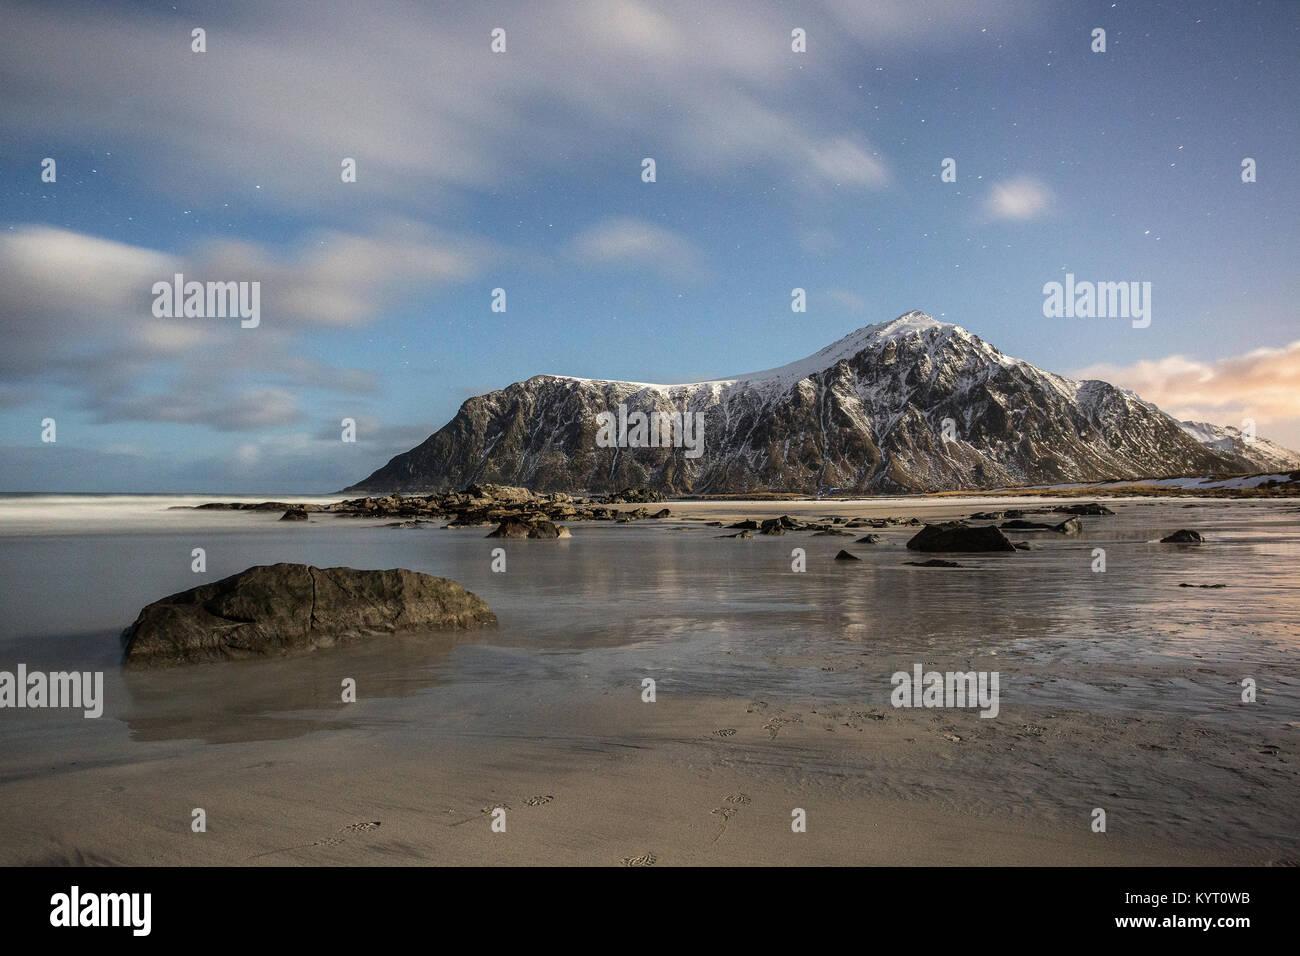 Skagsanden Beach, Lofoten Islands, Norway Stock Photo